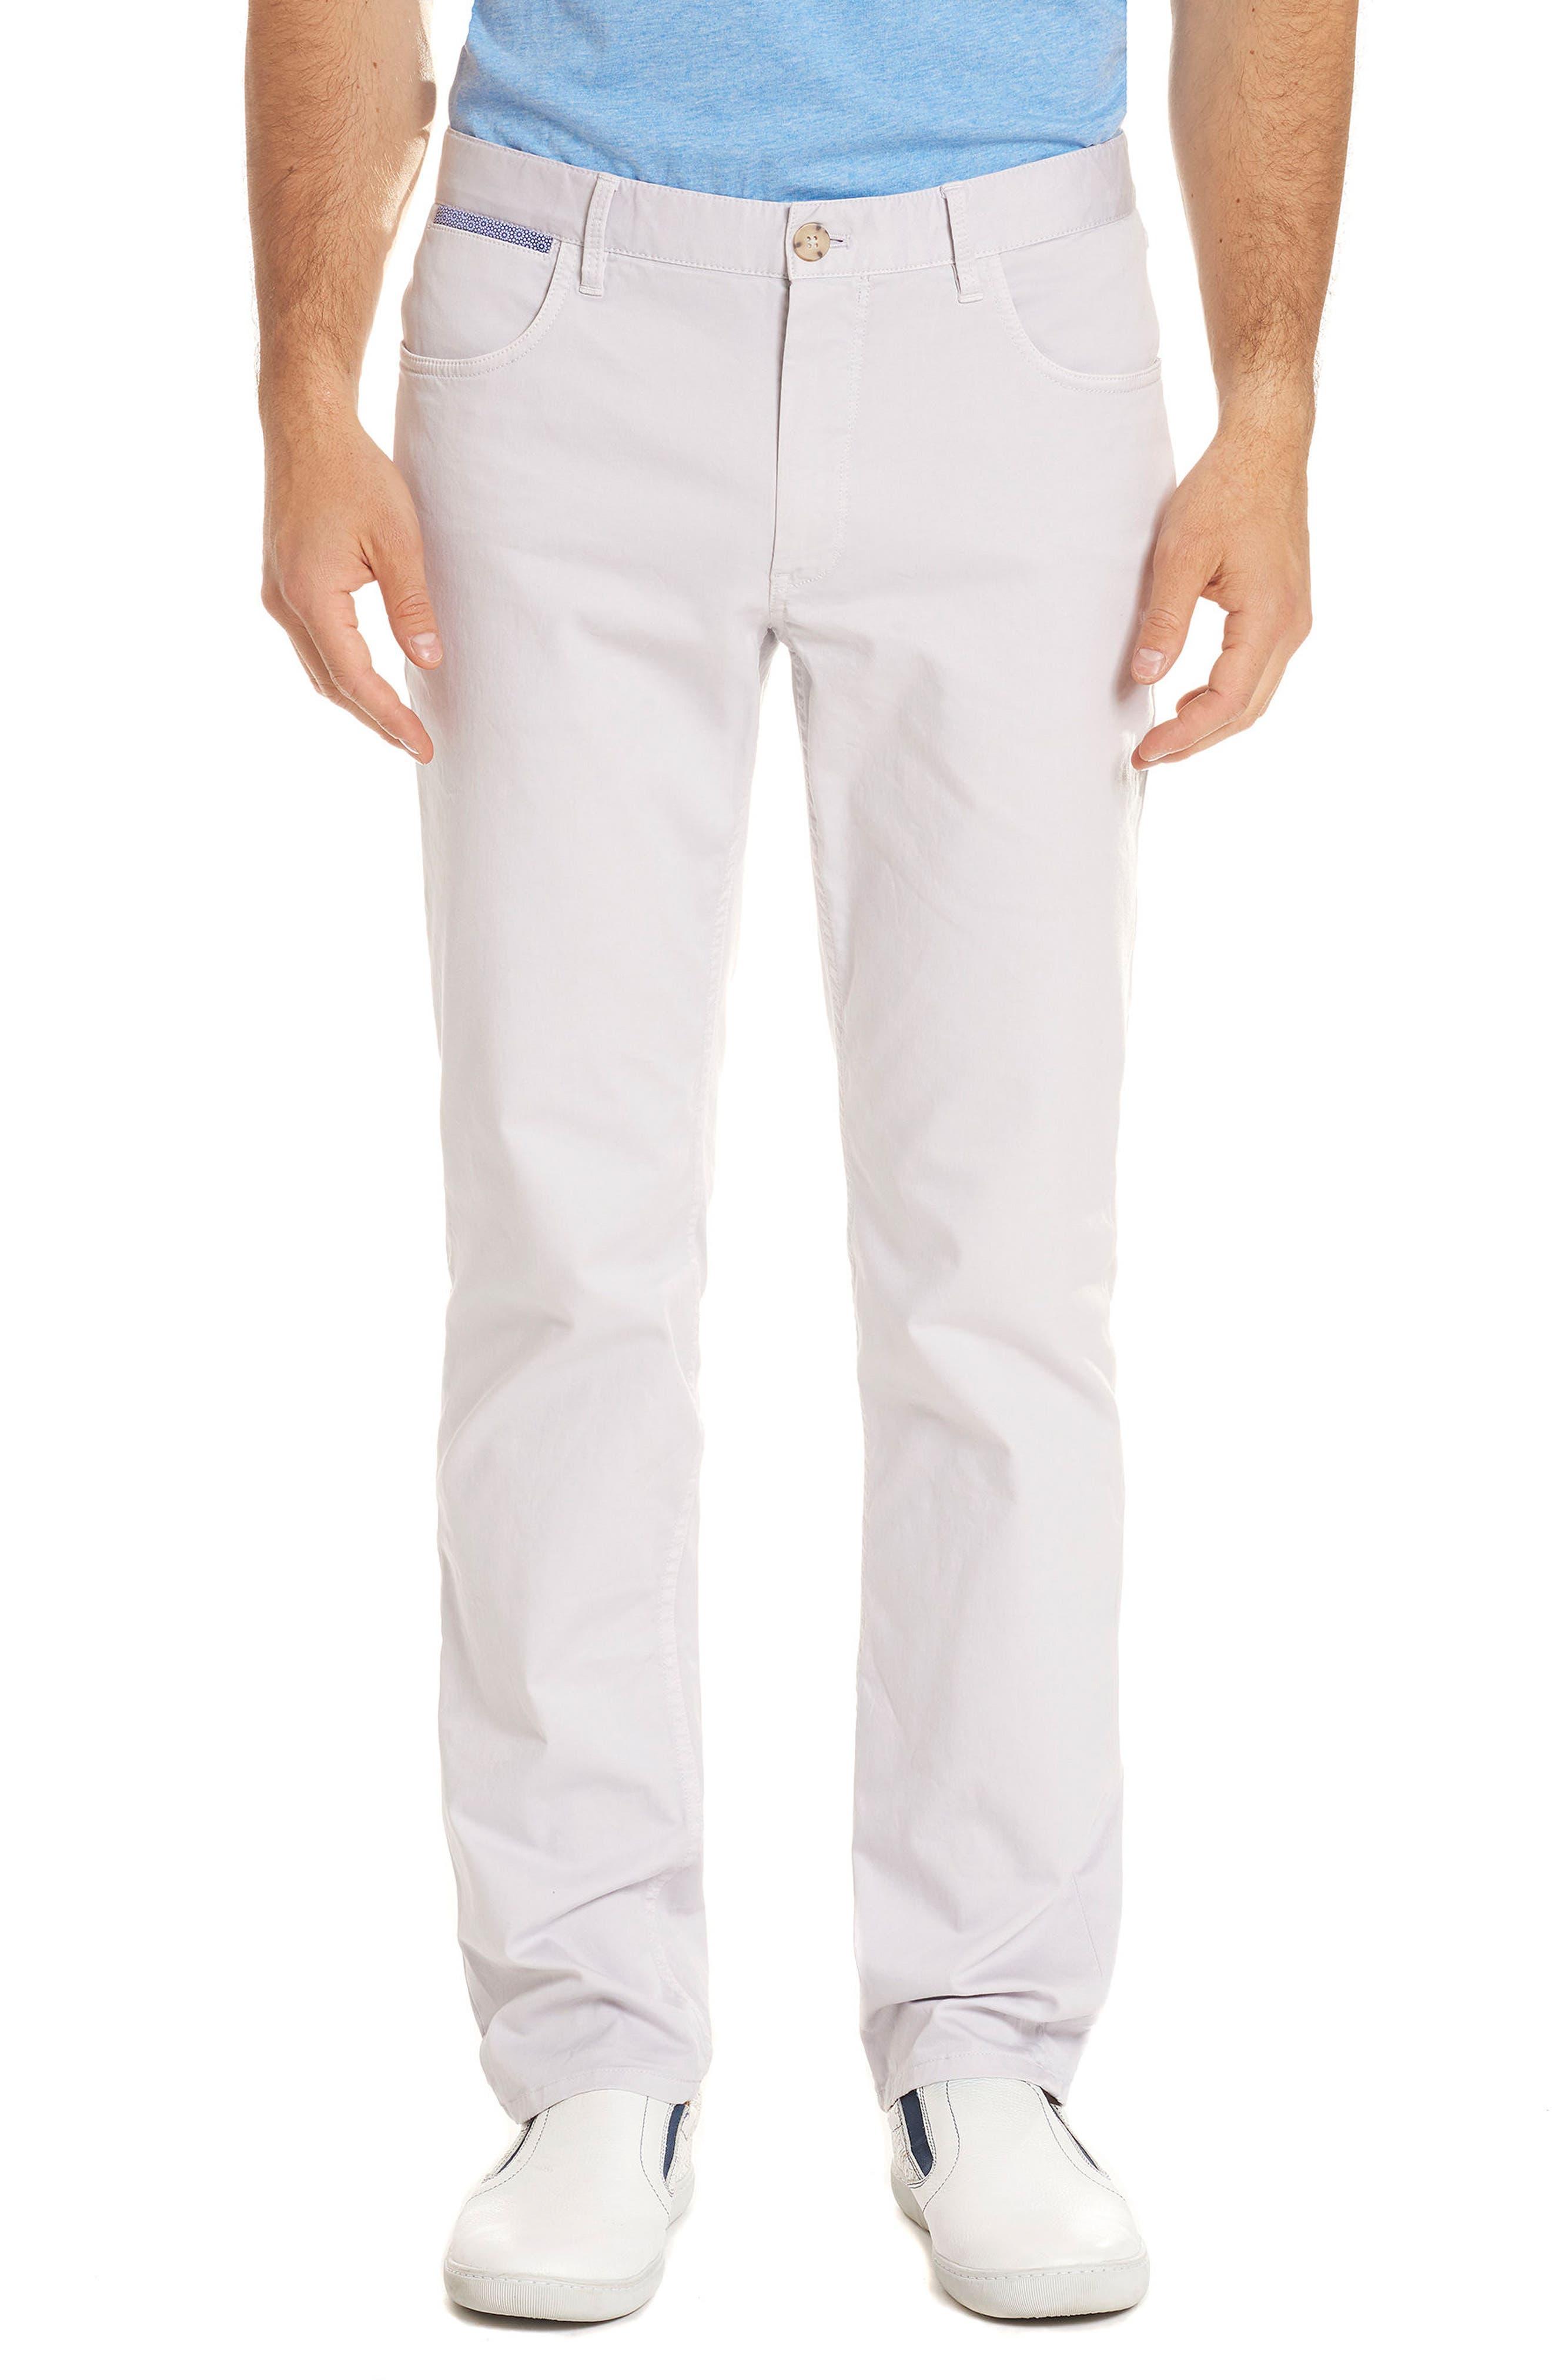 Marti Tailored Fit Pants,                             Main thumbnail 1, color,                             059